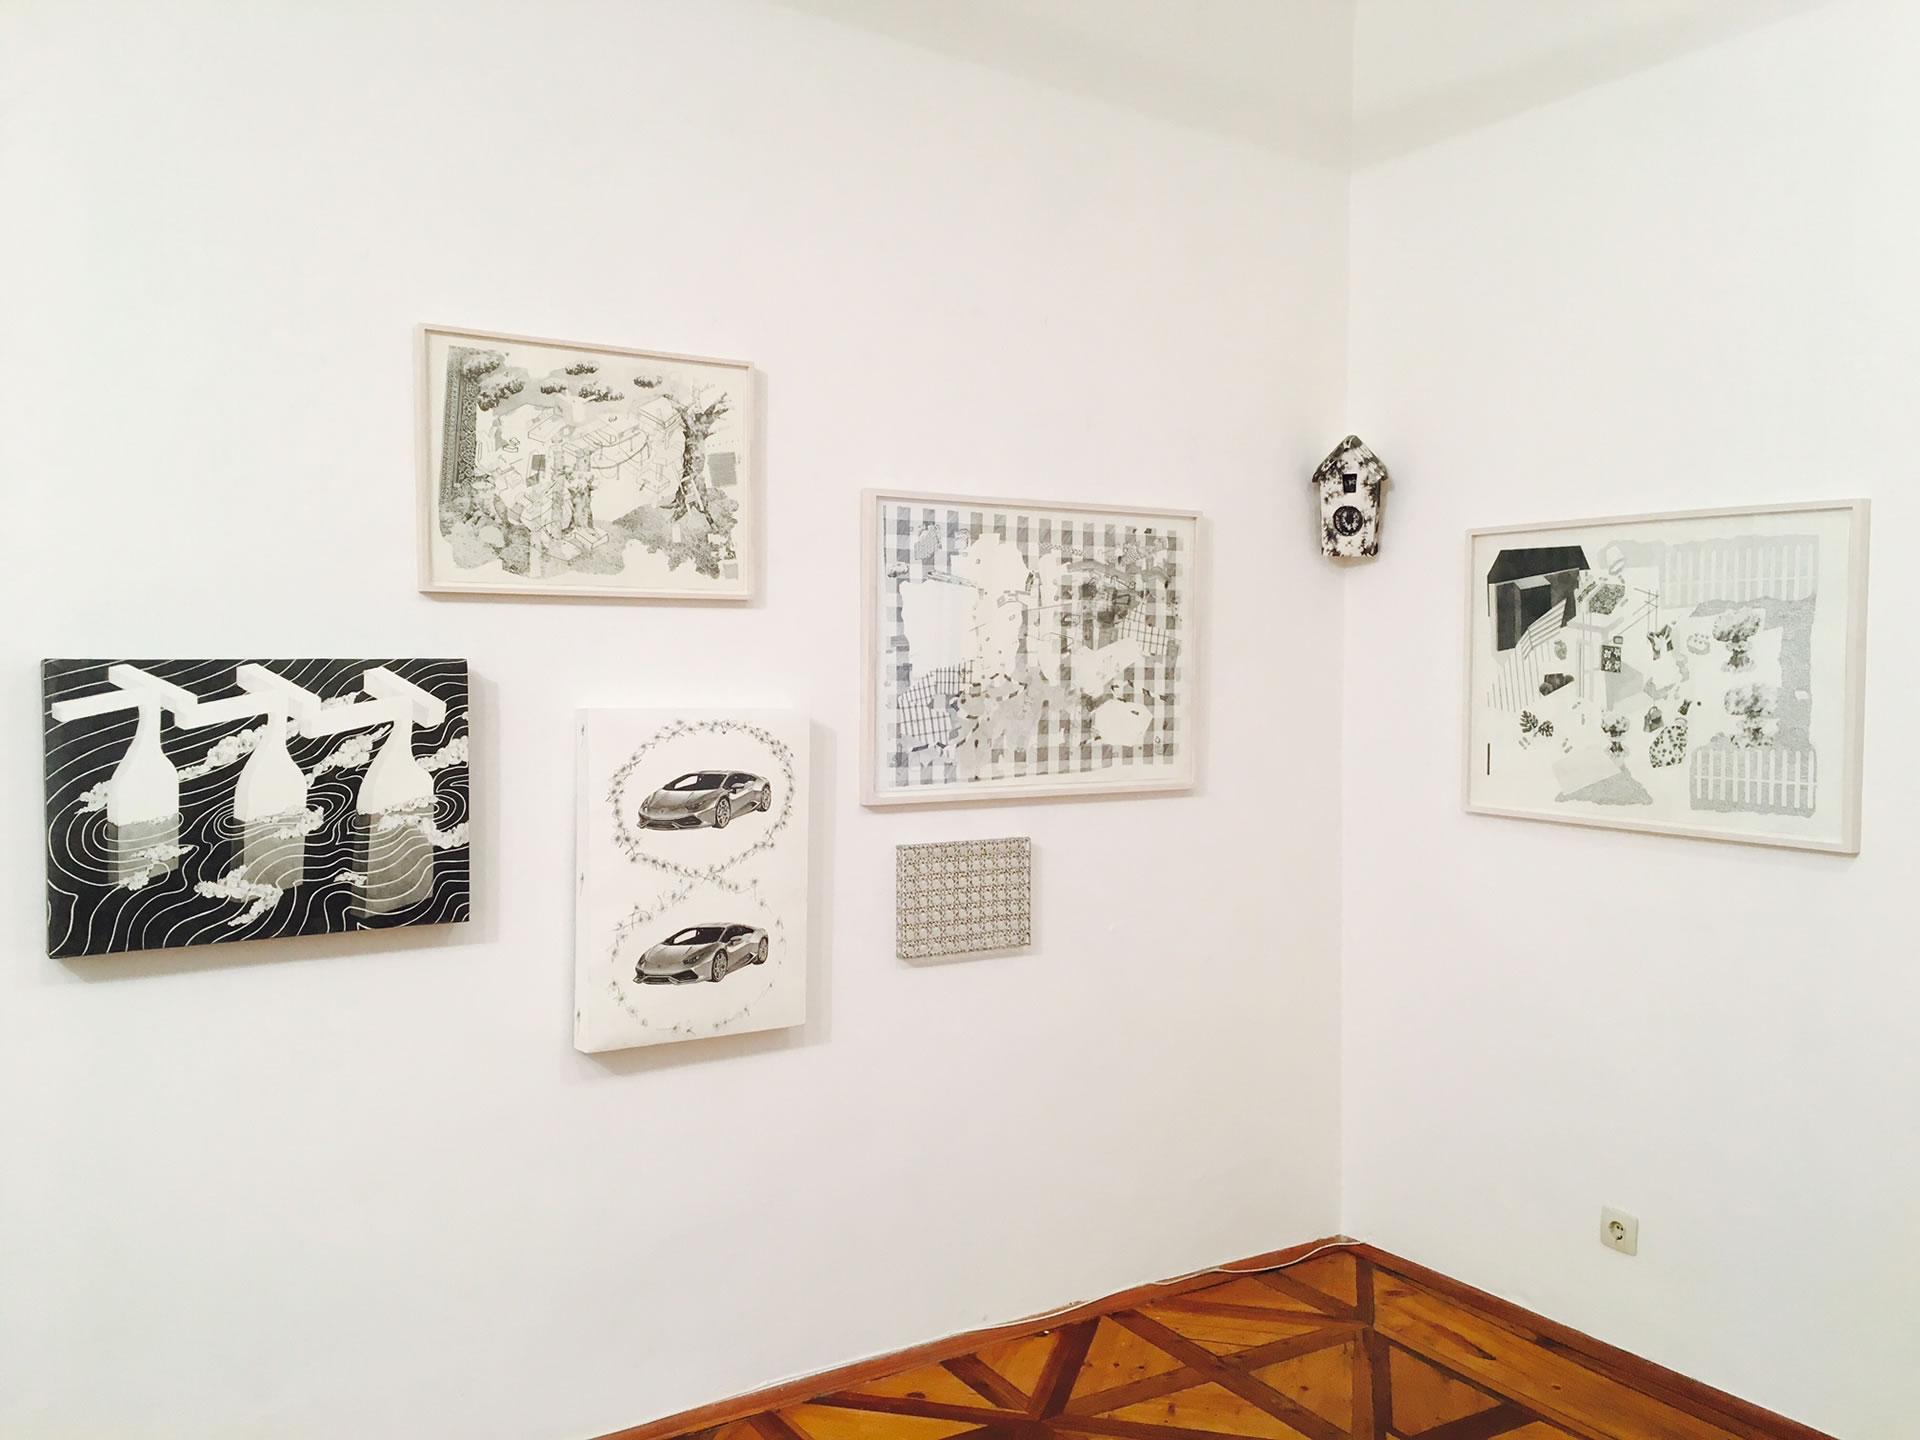 Galerie3 | Kopfkino | 08 | Patrick Roman Scherer